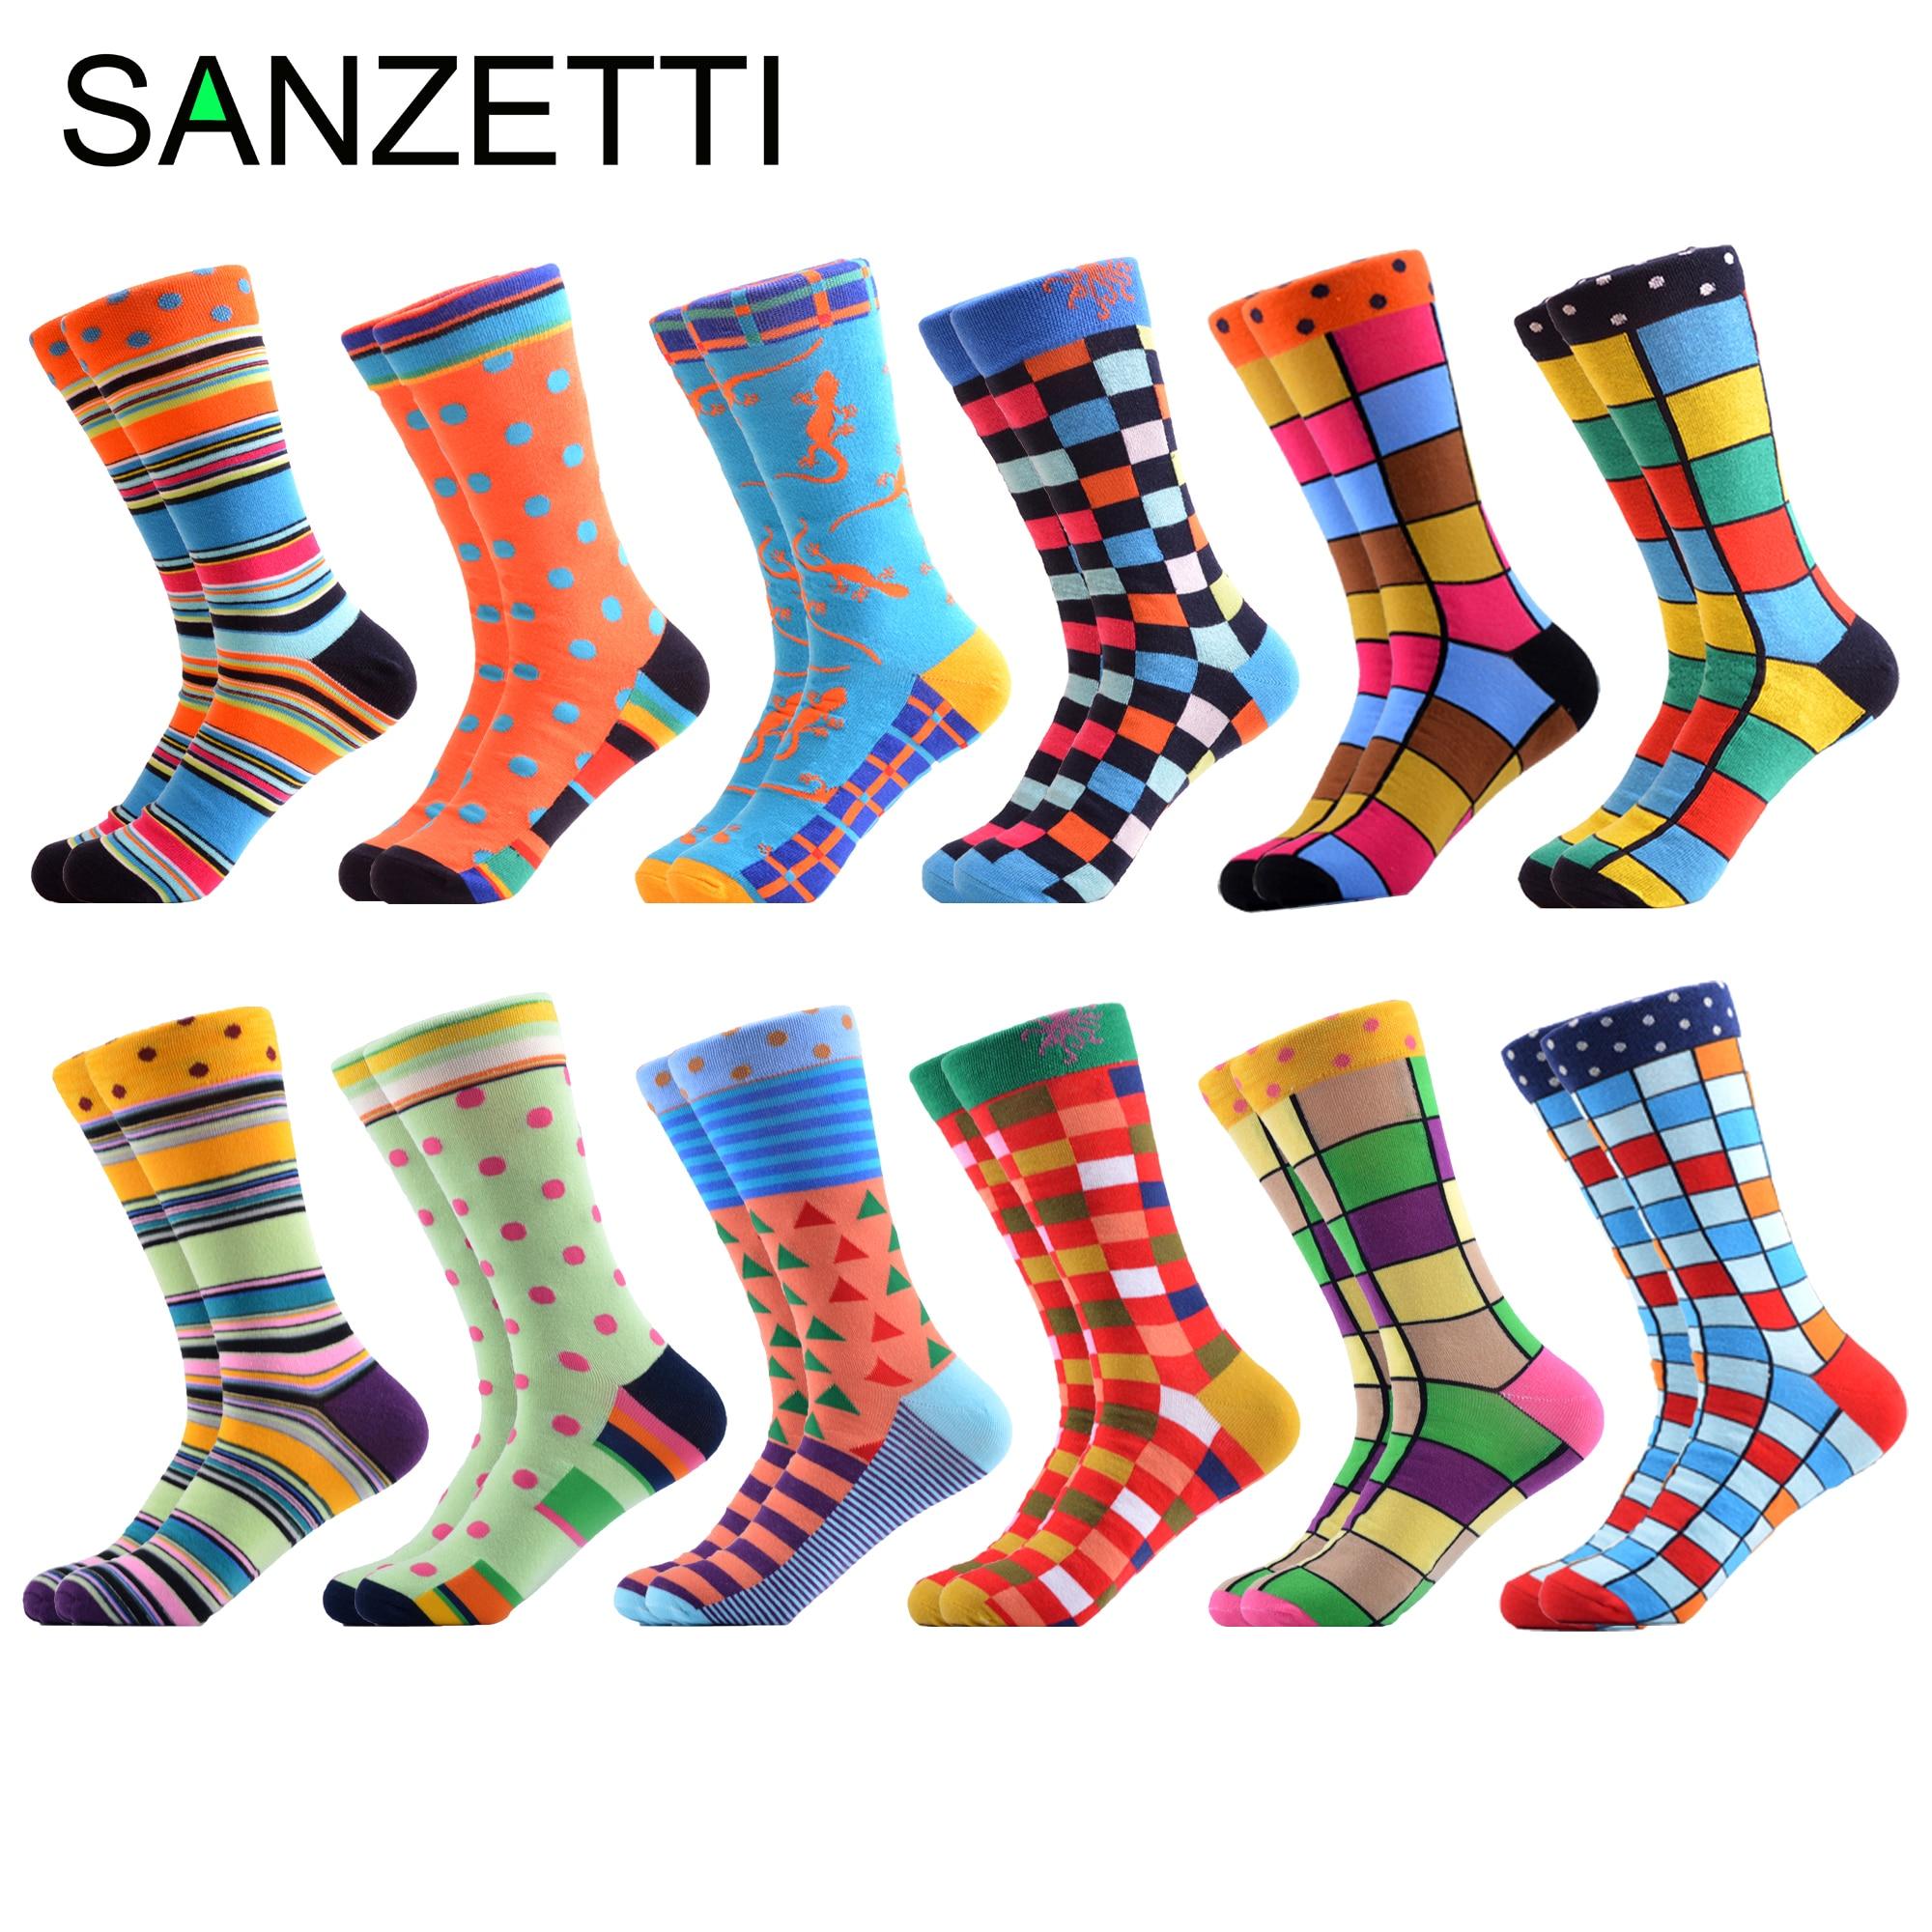 SANZETTI Men Colorful Casual Crew Socks Combed Cotton Design Harajuku Socks Hip Hop Geometric Plaid Stripe Dot Gifts Happy Socks